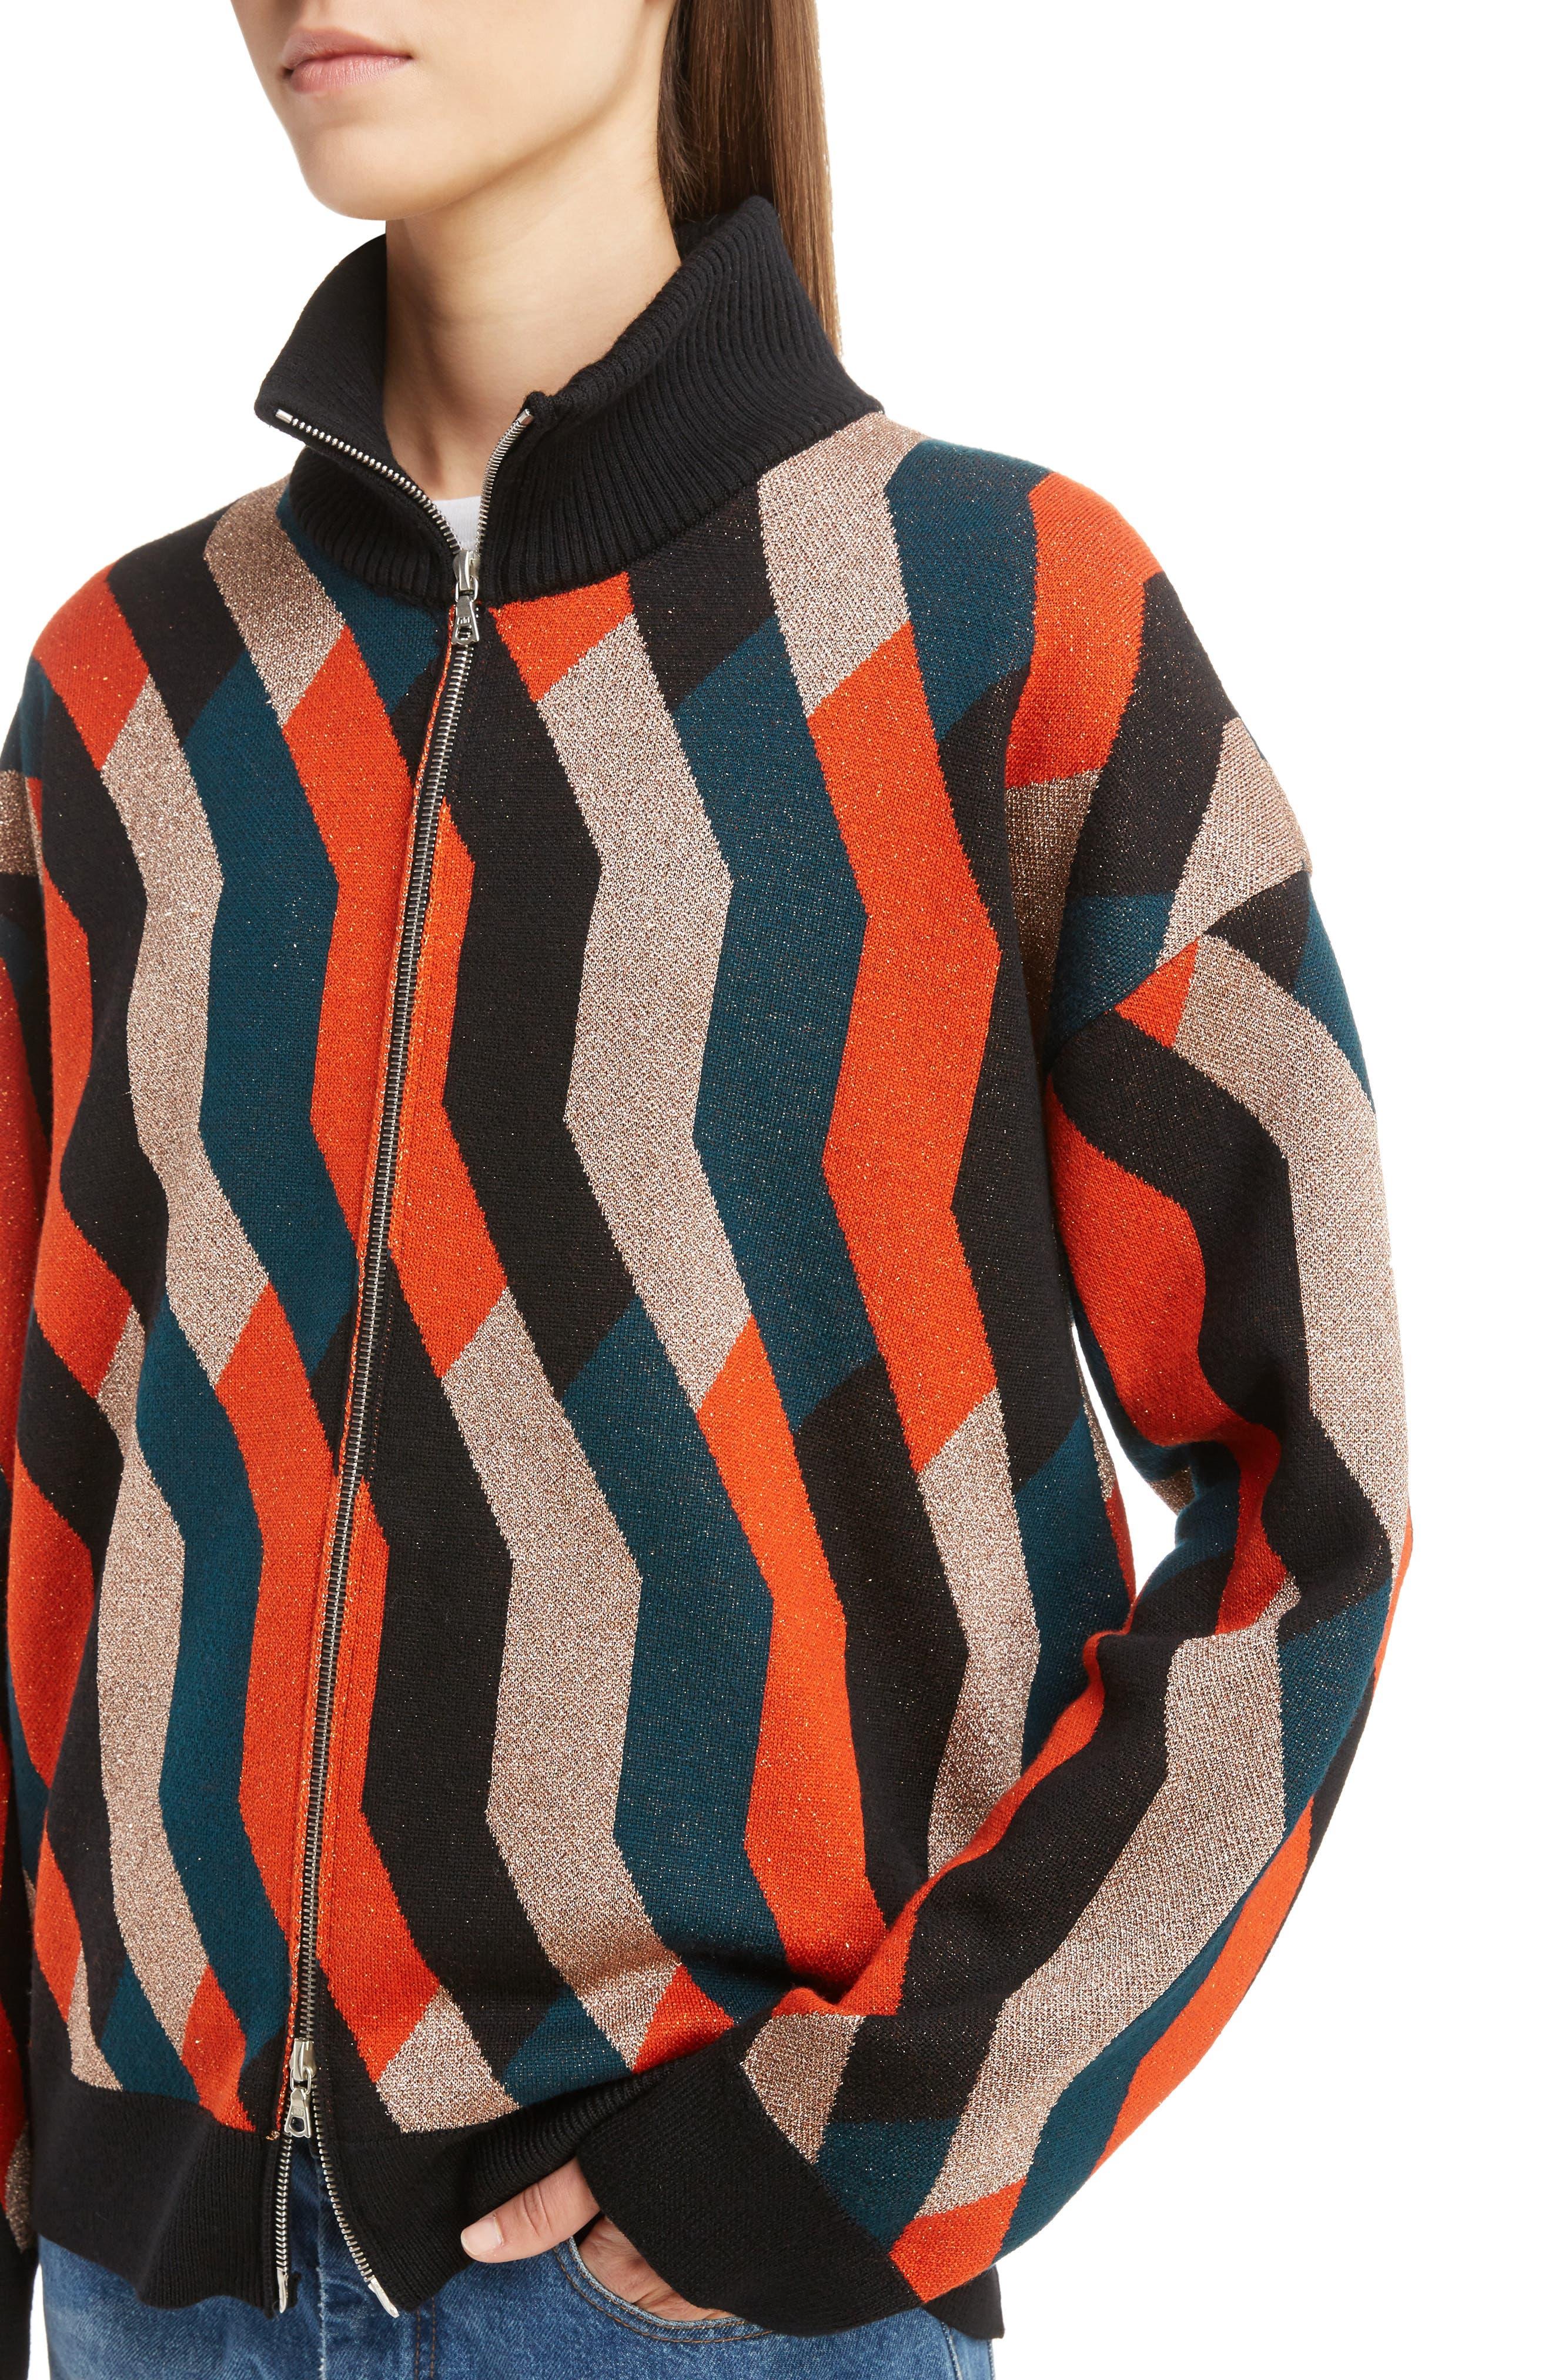 Graphic Knit Merino Wool Cardigan,                             Alternate thumbnail 4, color,                             600